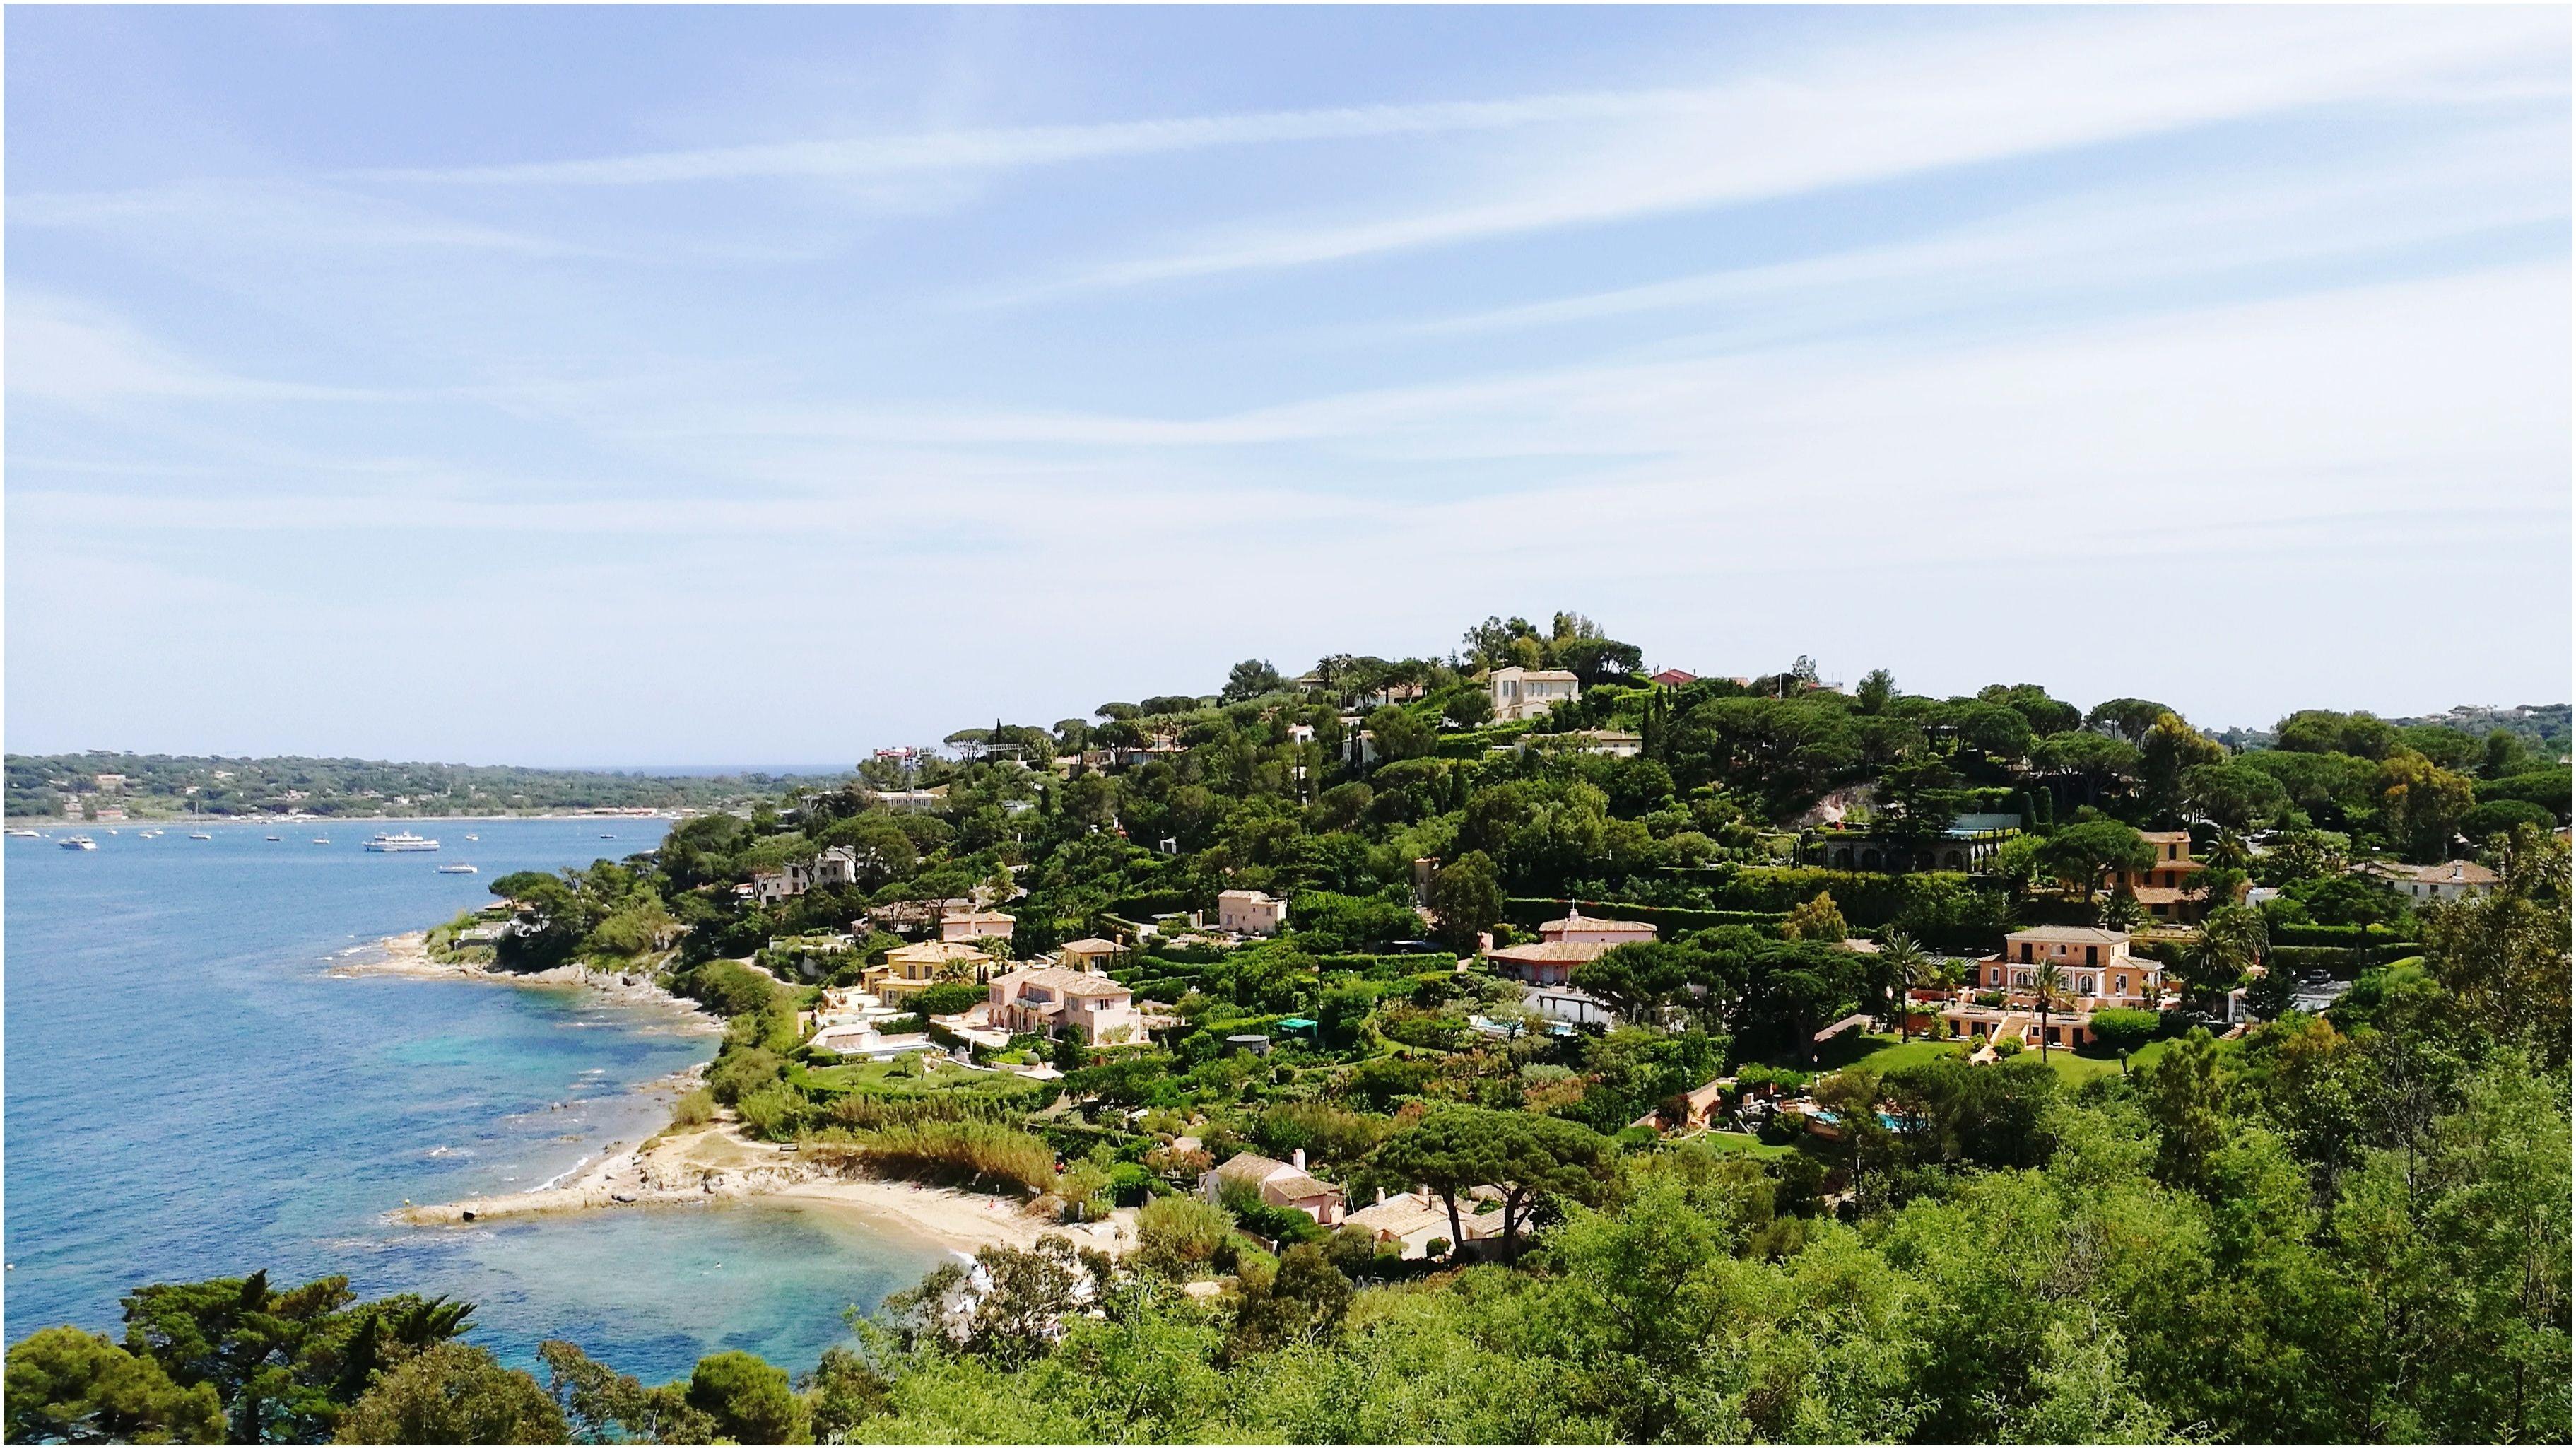 Beautiful Beaches Italian Riviera Best Of Best Mediterranean Beaches In France From St Tropez to Menton